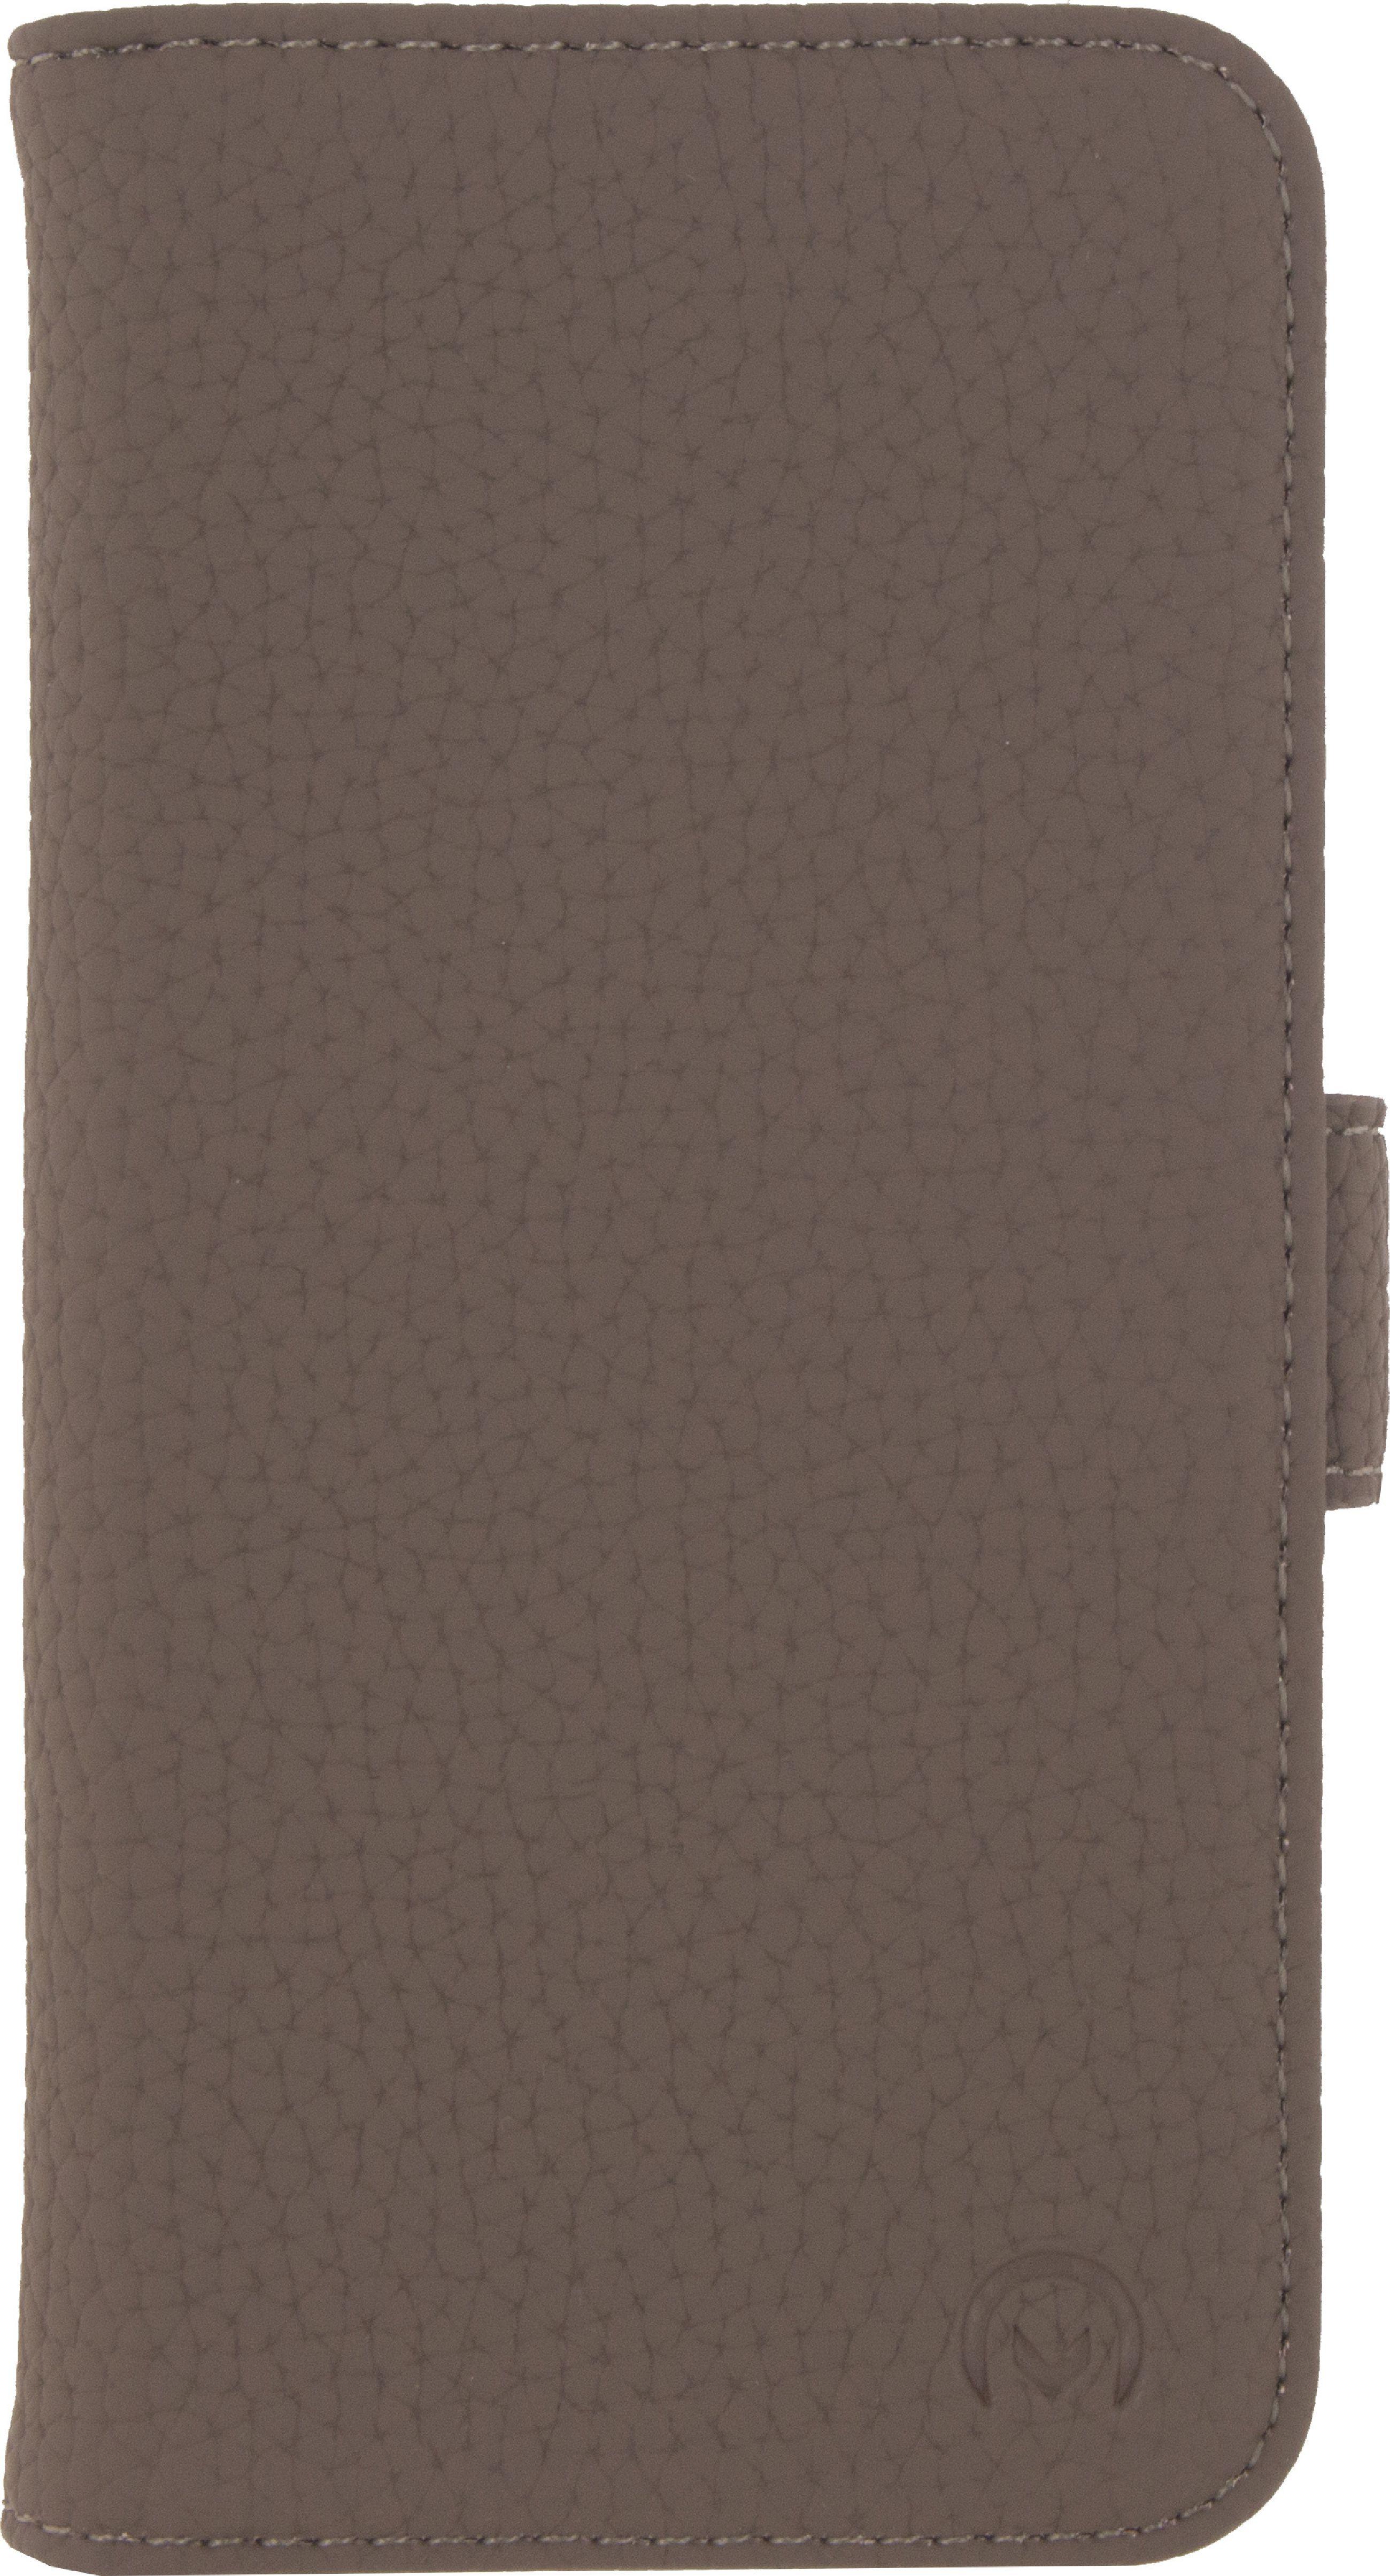 Image of   Telefon Klassisk Lommebogsetui Huawei P10 Brun